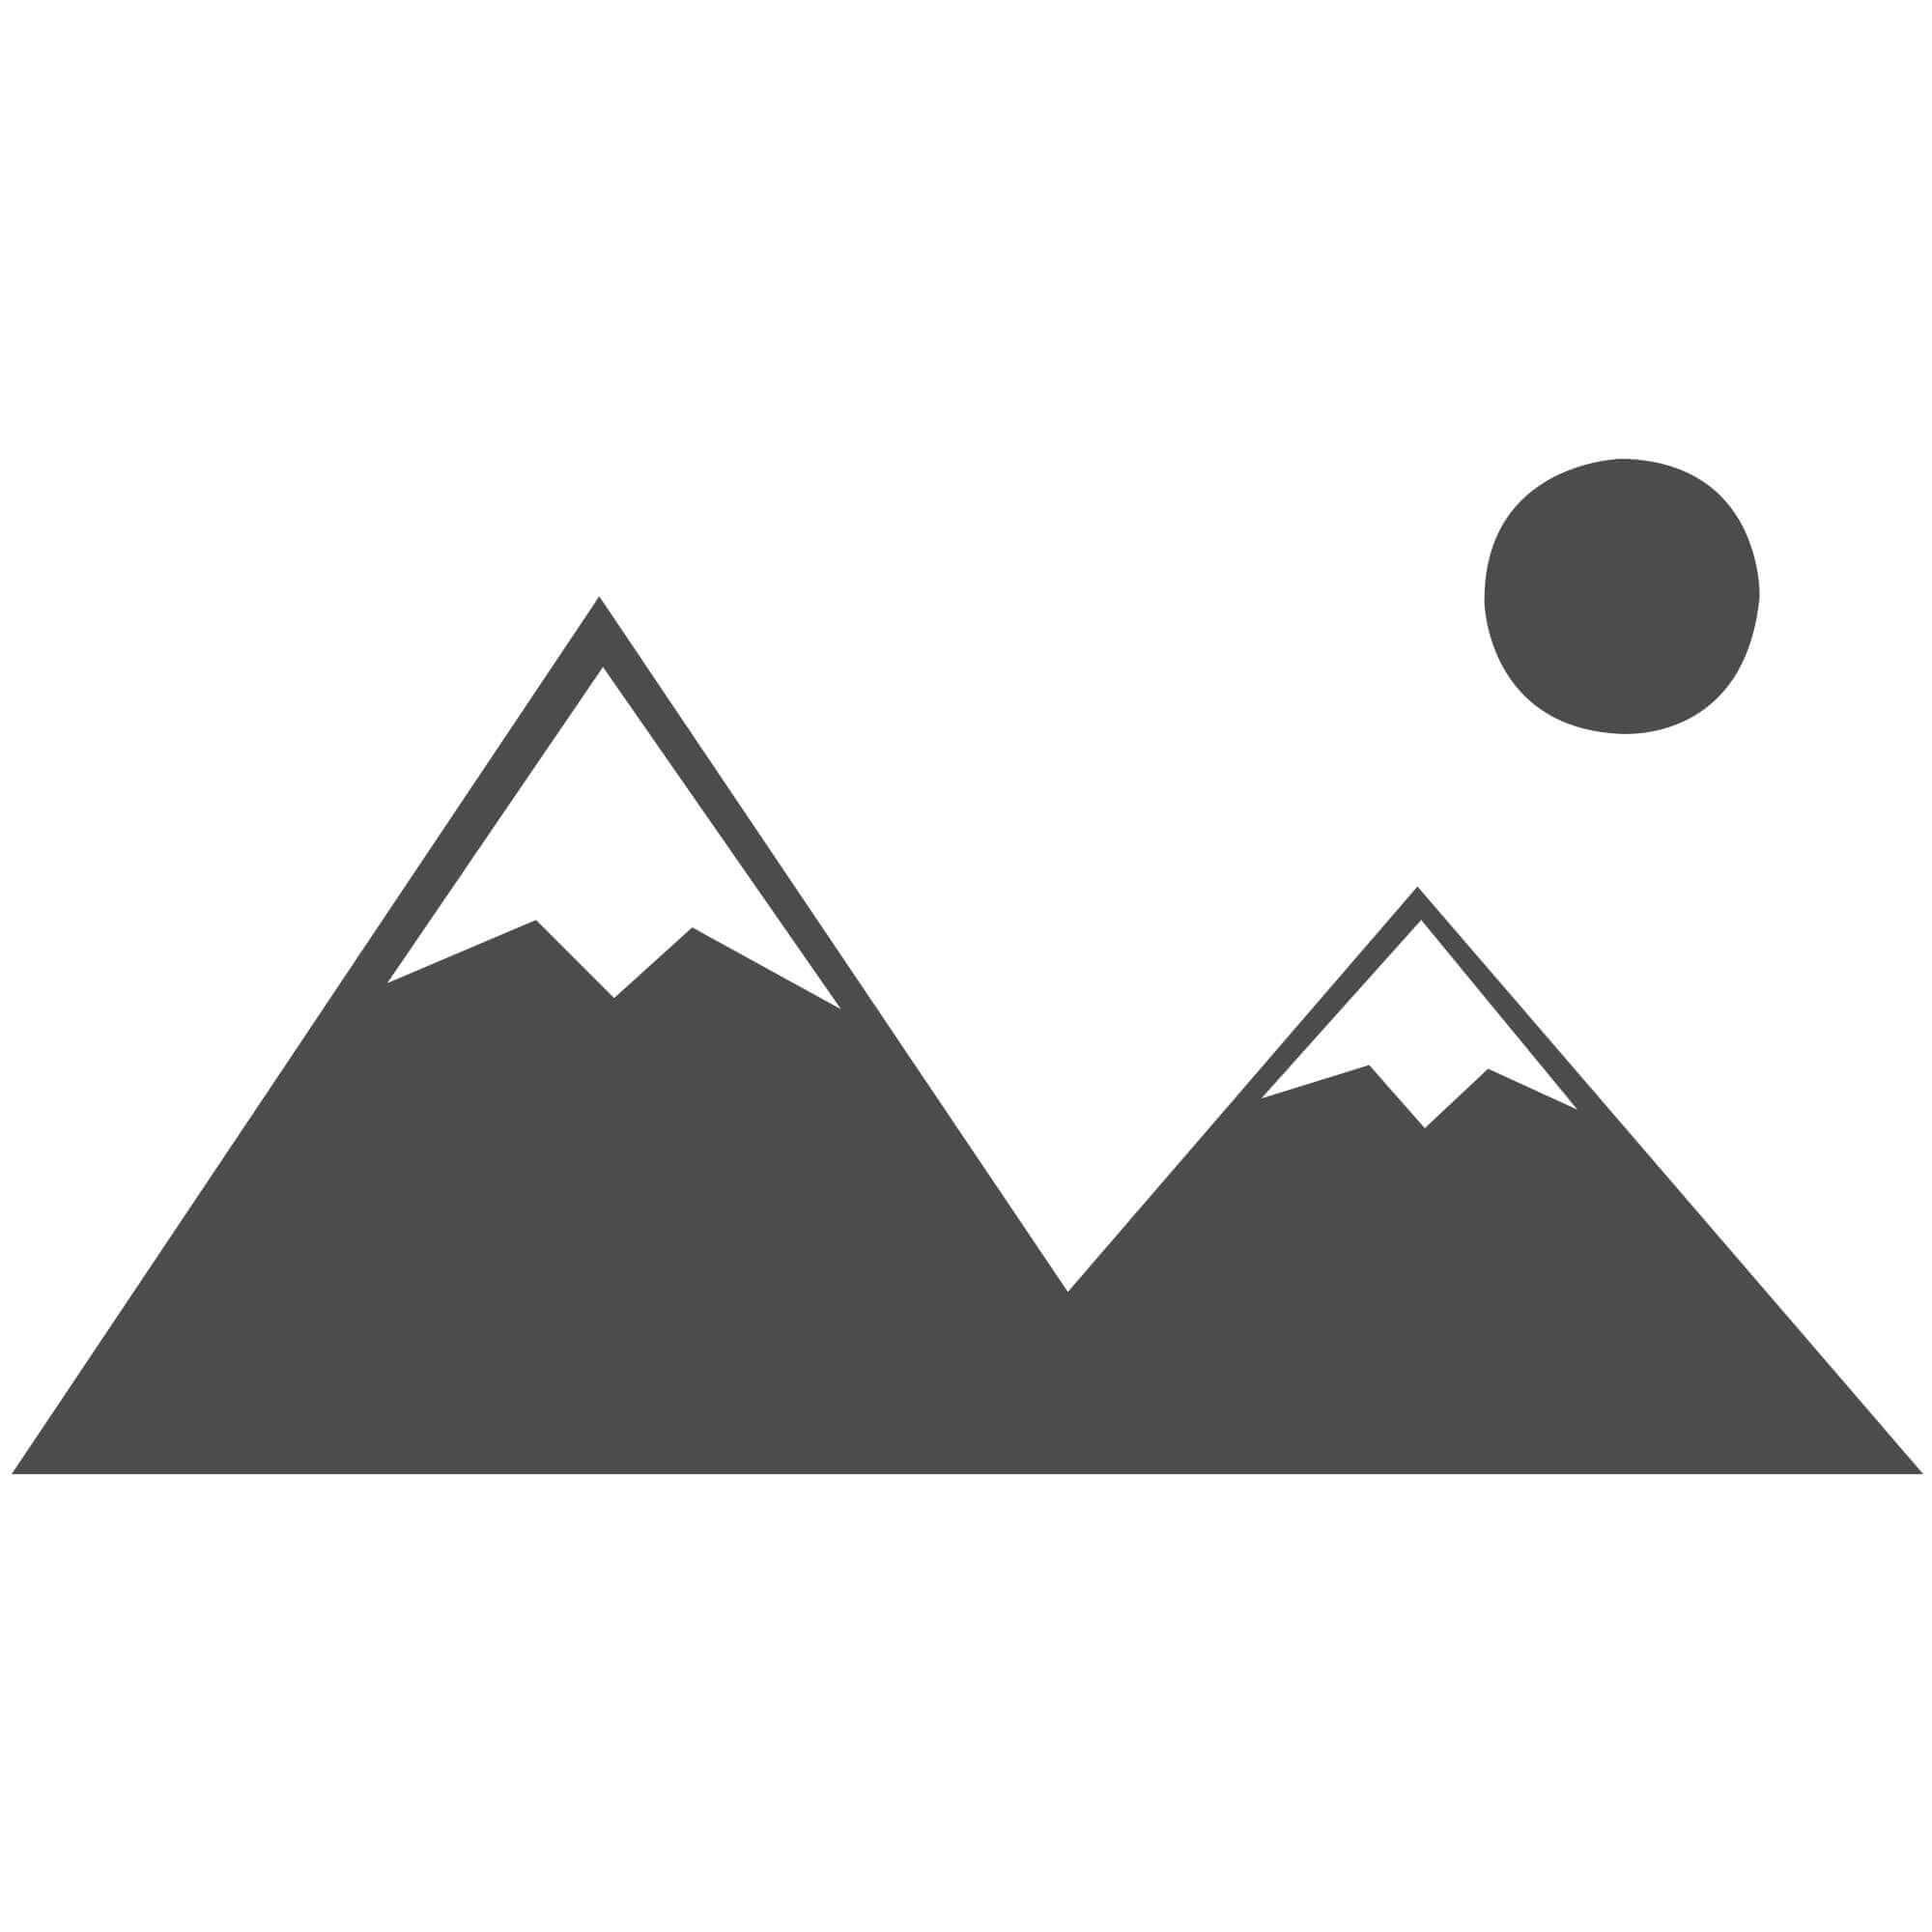 "Florence Alfresco Moretti Rug - Black Beige - Size 160 x 230 cm (5'3"" x 7'7"")"